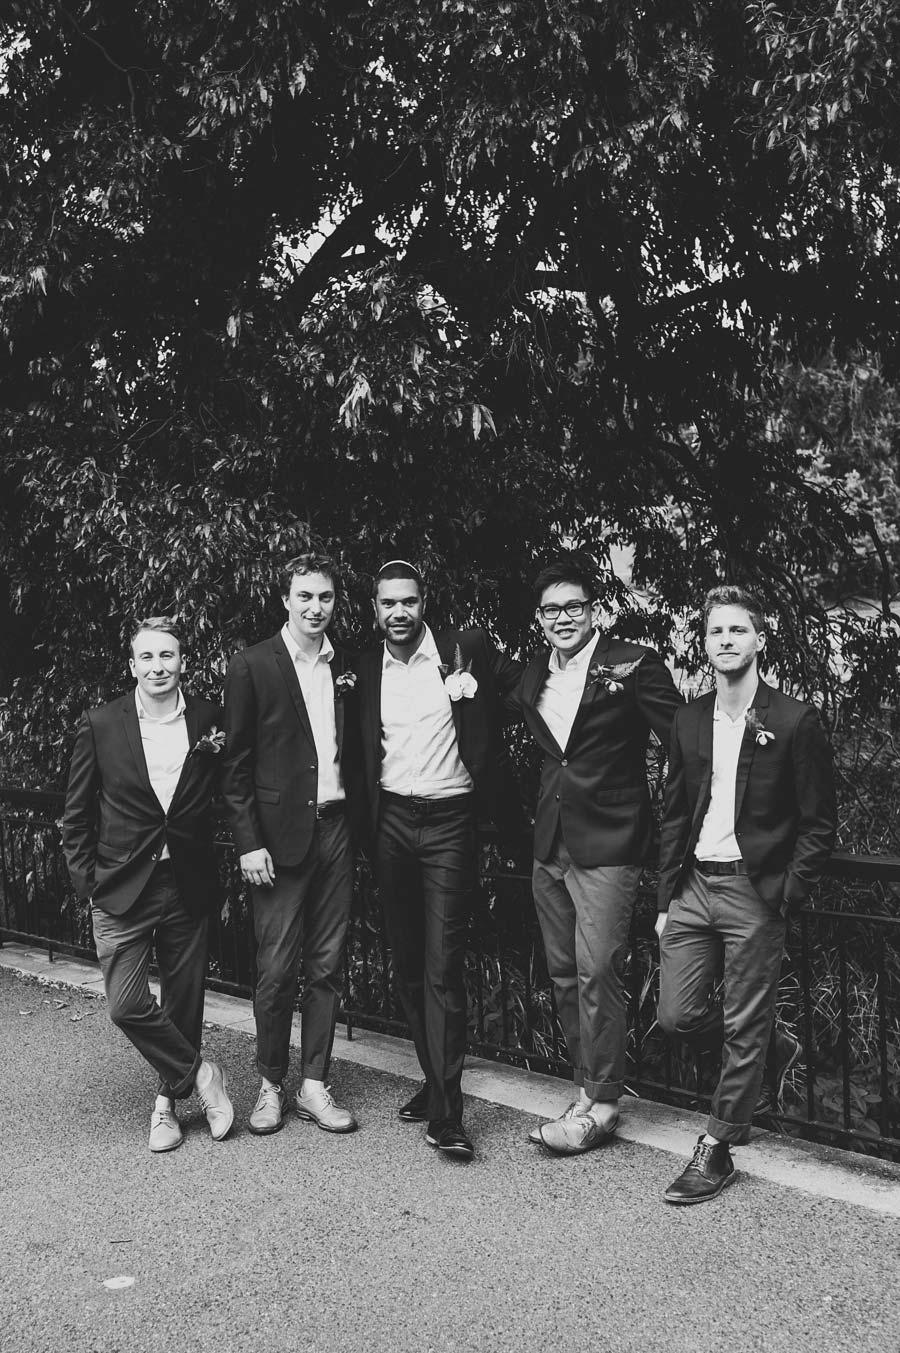 Melbourne royal botanical garden Jewish groomsmen